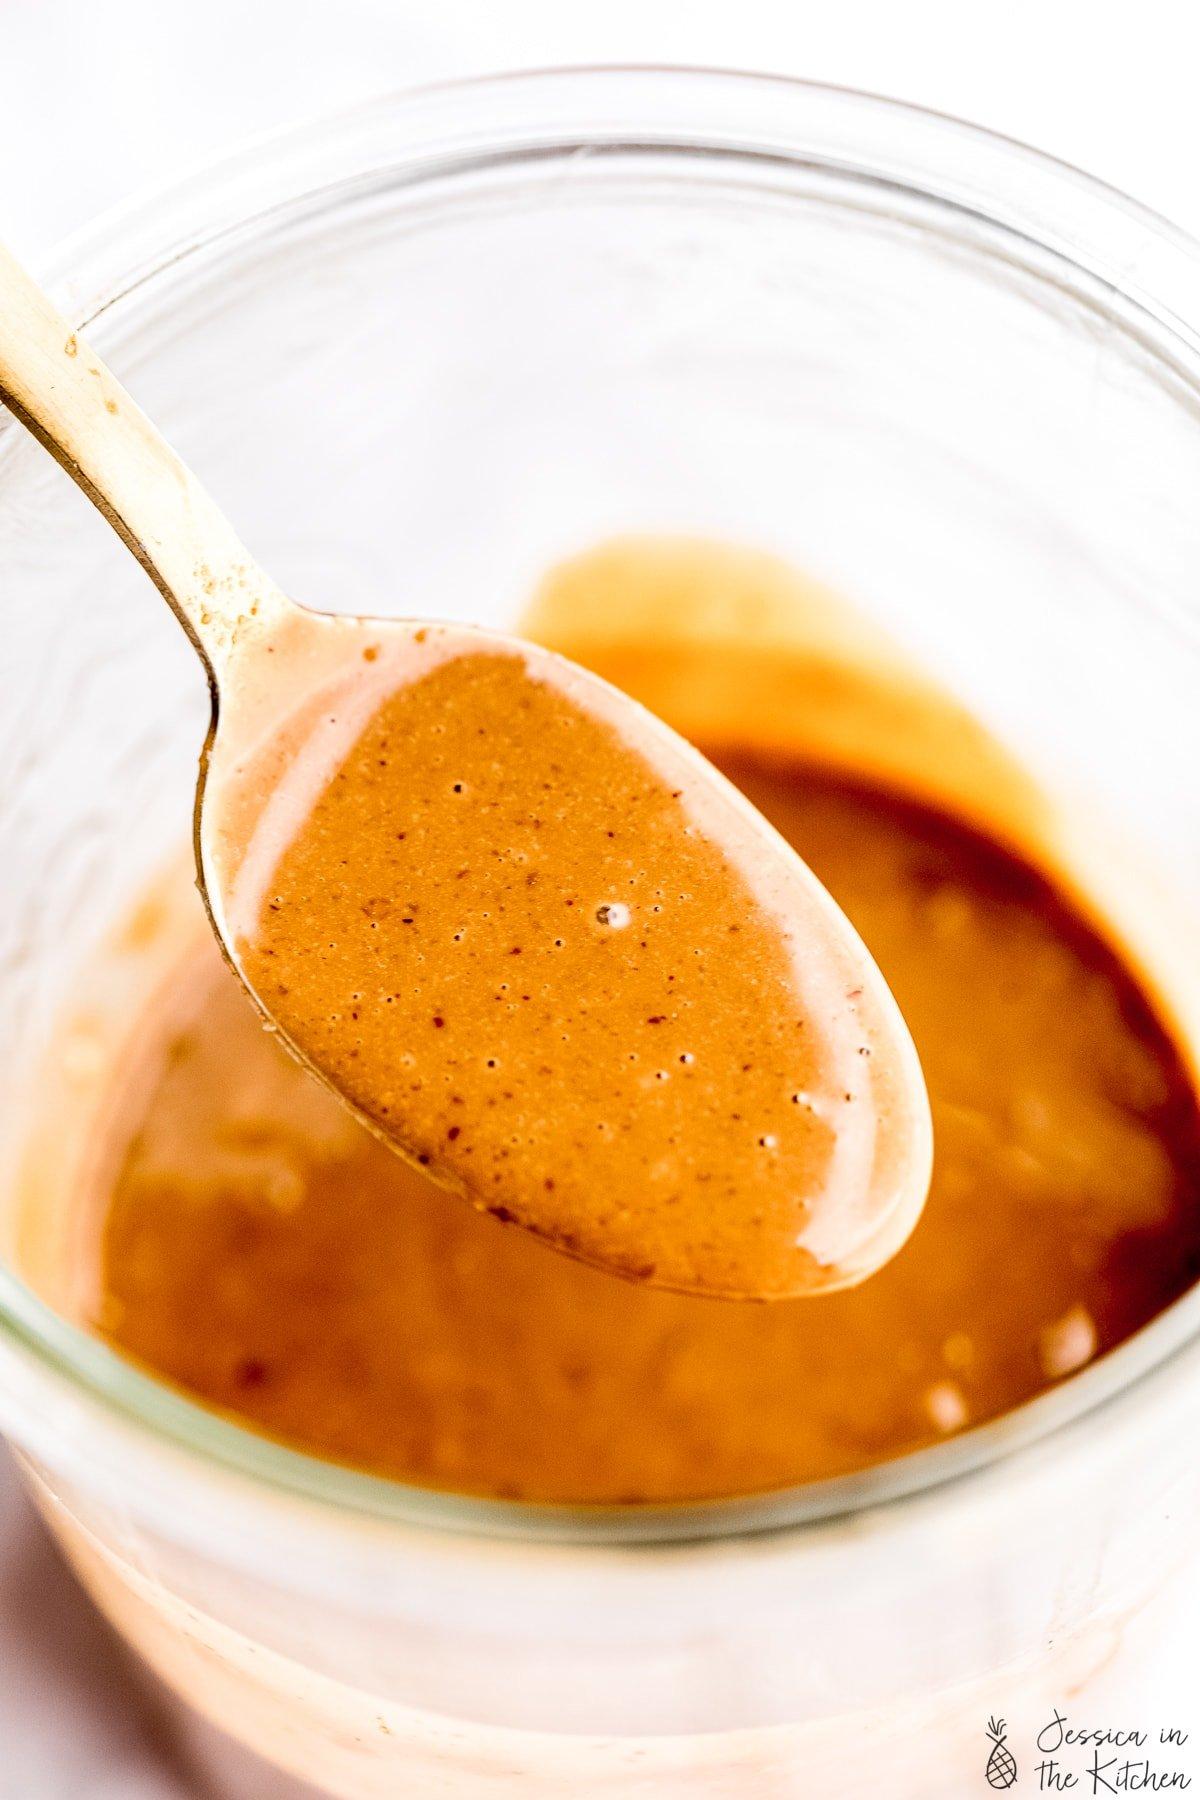 Thai peanut sauce in a gold spoon over a jar